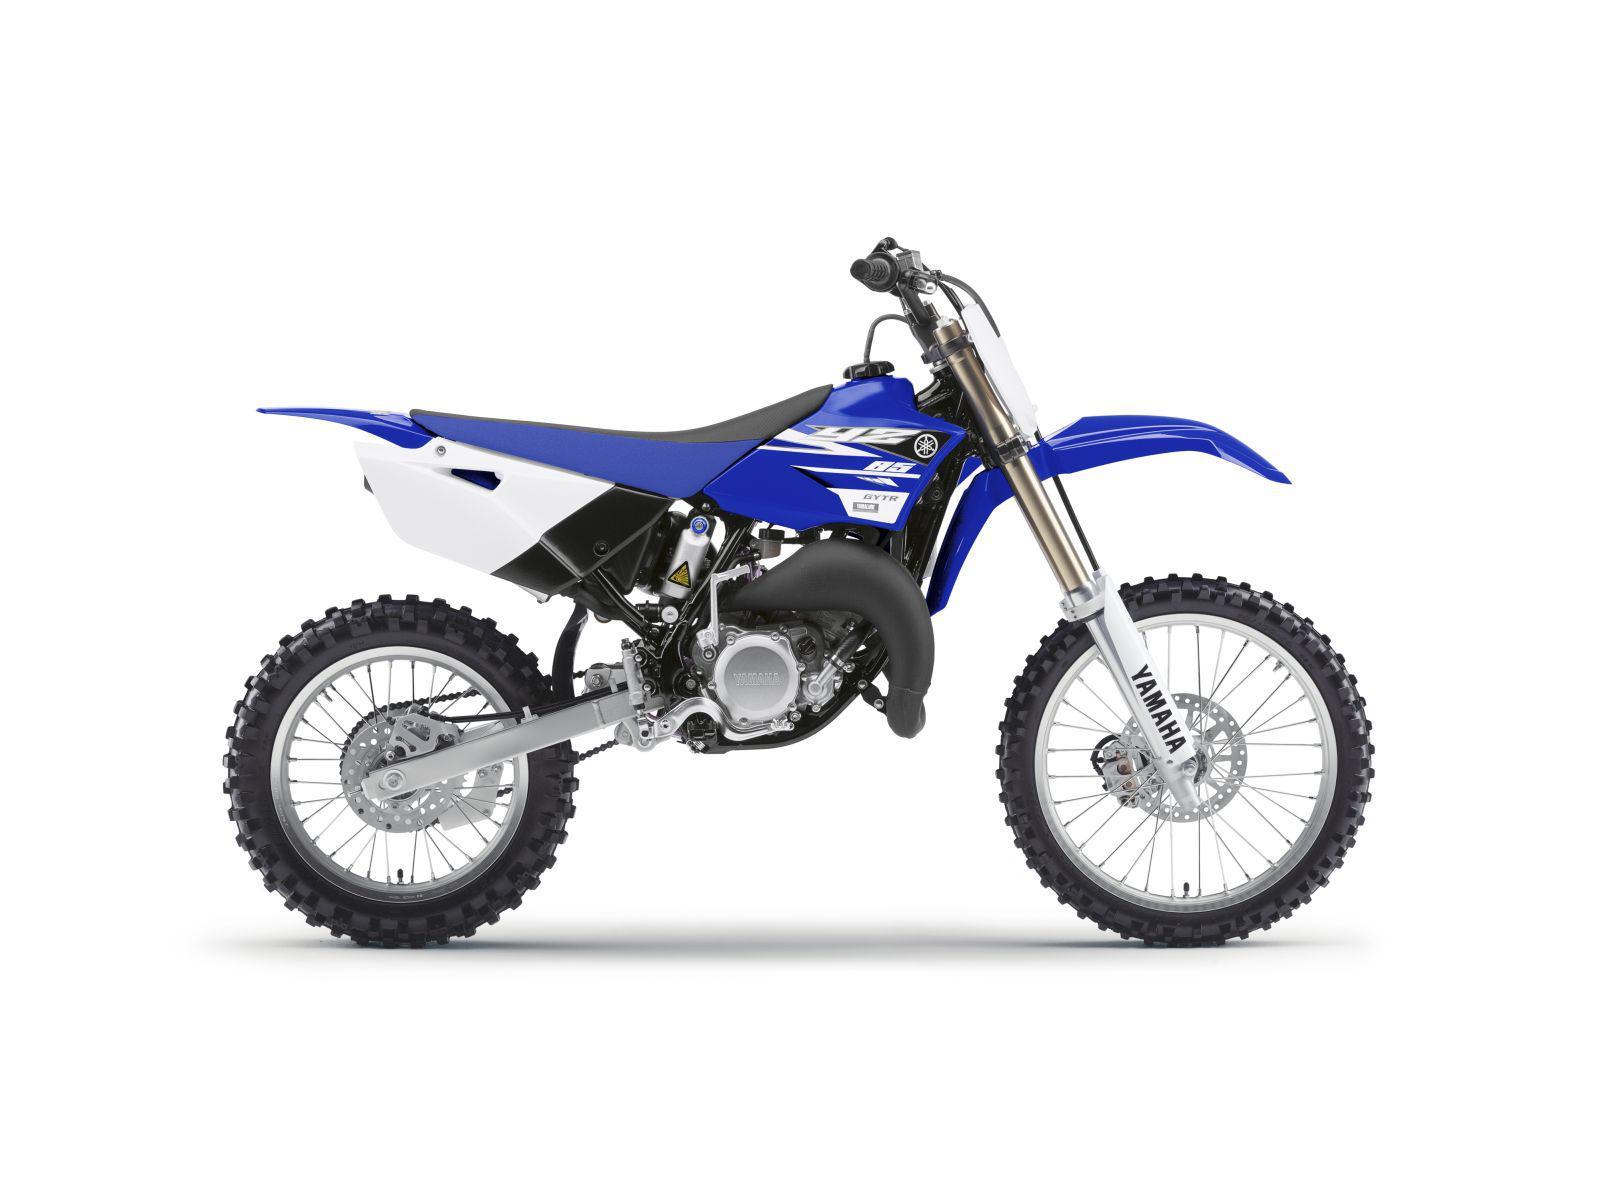 Motorrder - Yamaha Motor Deutschland GmbH